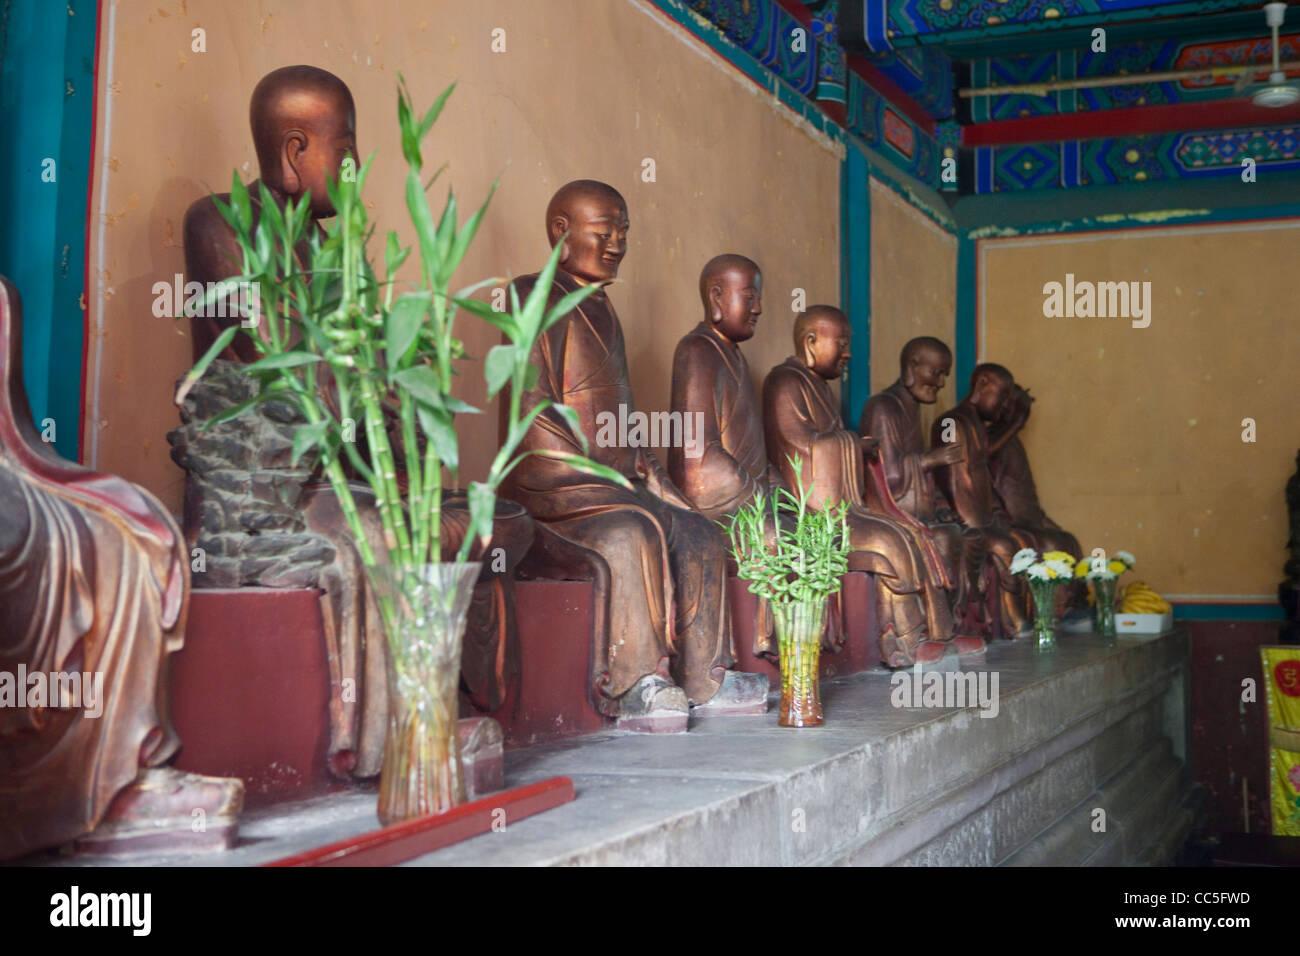 Disciple statues, Fa Yuan Temple, Beijing, China - Stock Image